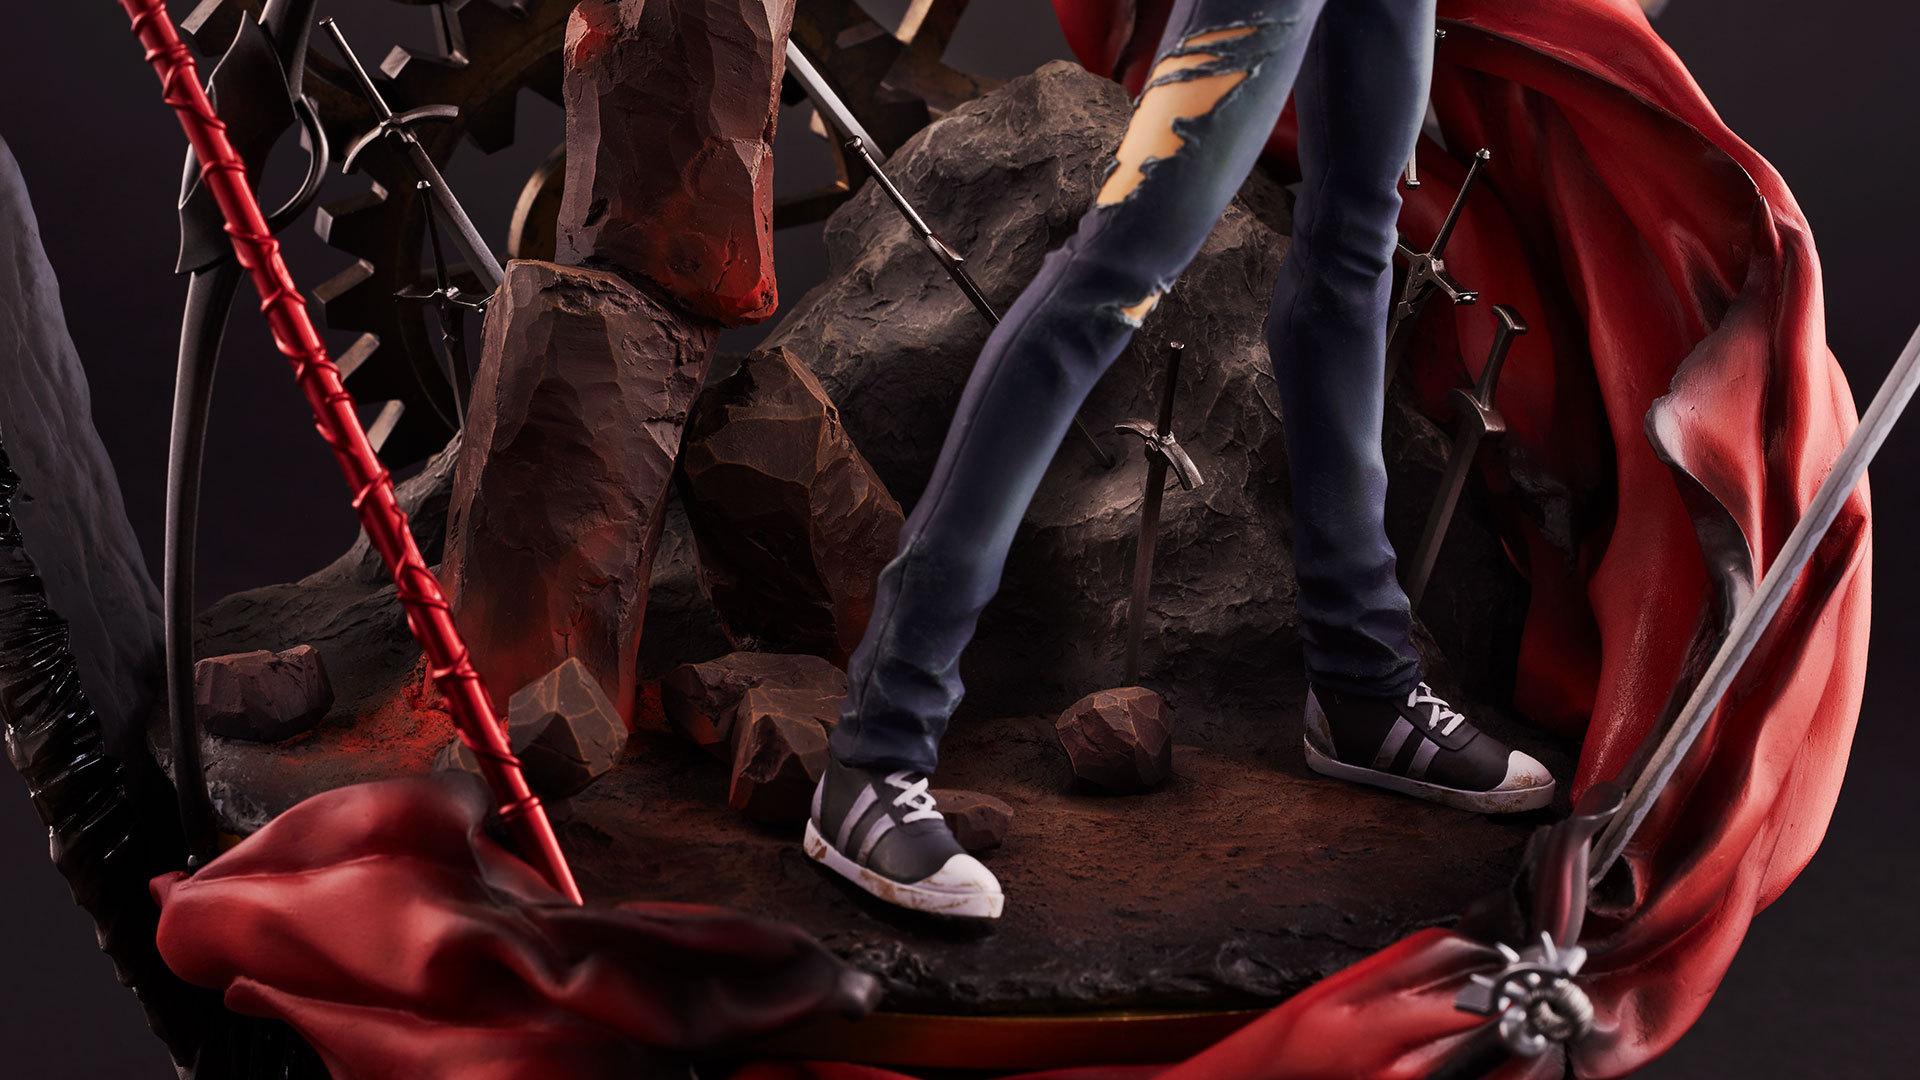 Fate/stay night 15周年纪念Figure -轨迹- Aniplex+